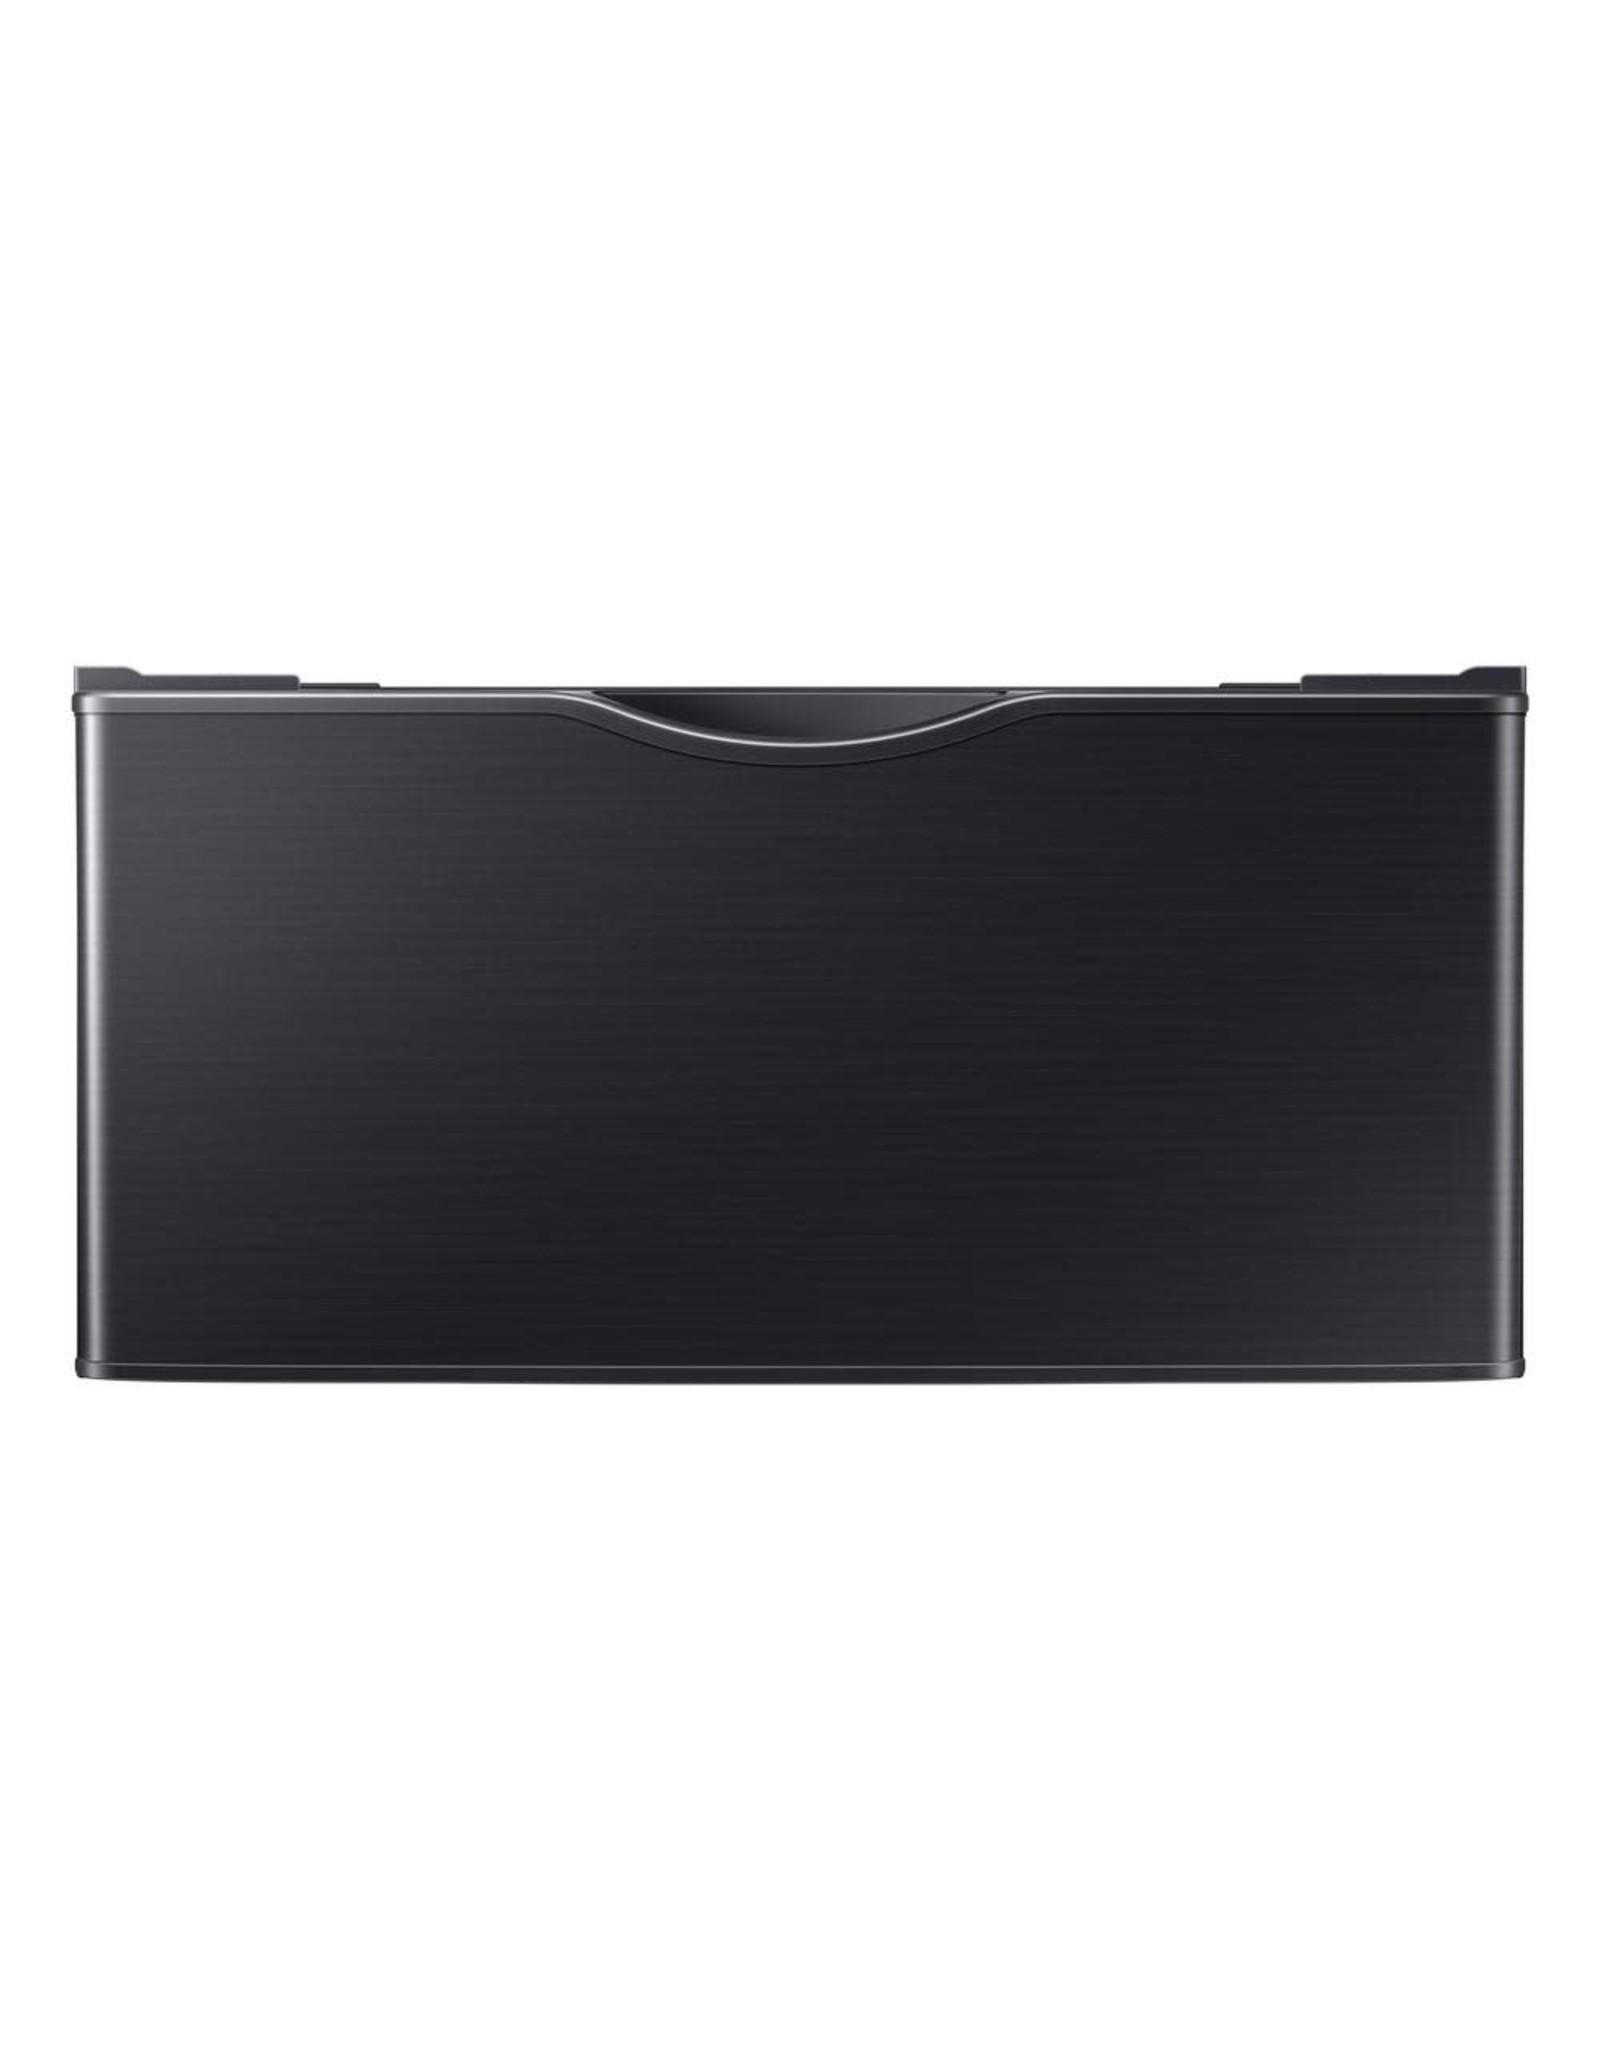 SAMSUNG WE402NV 14.2 in. Fingerprint-Resistant Black Stainless Laundry Pedestal with Storage Drawer